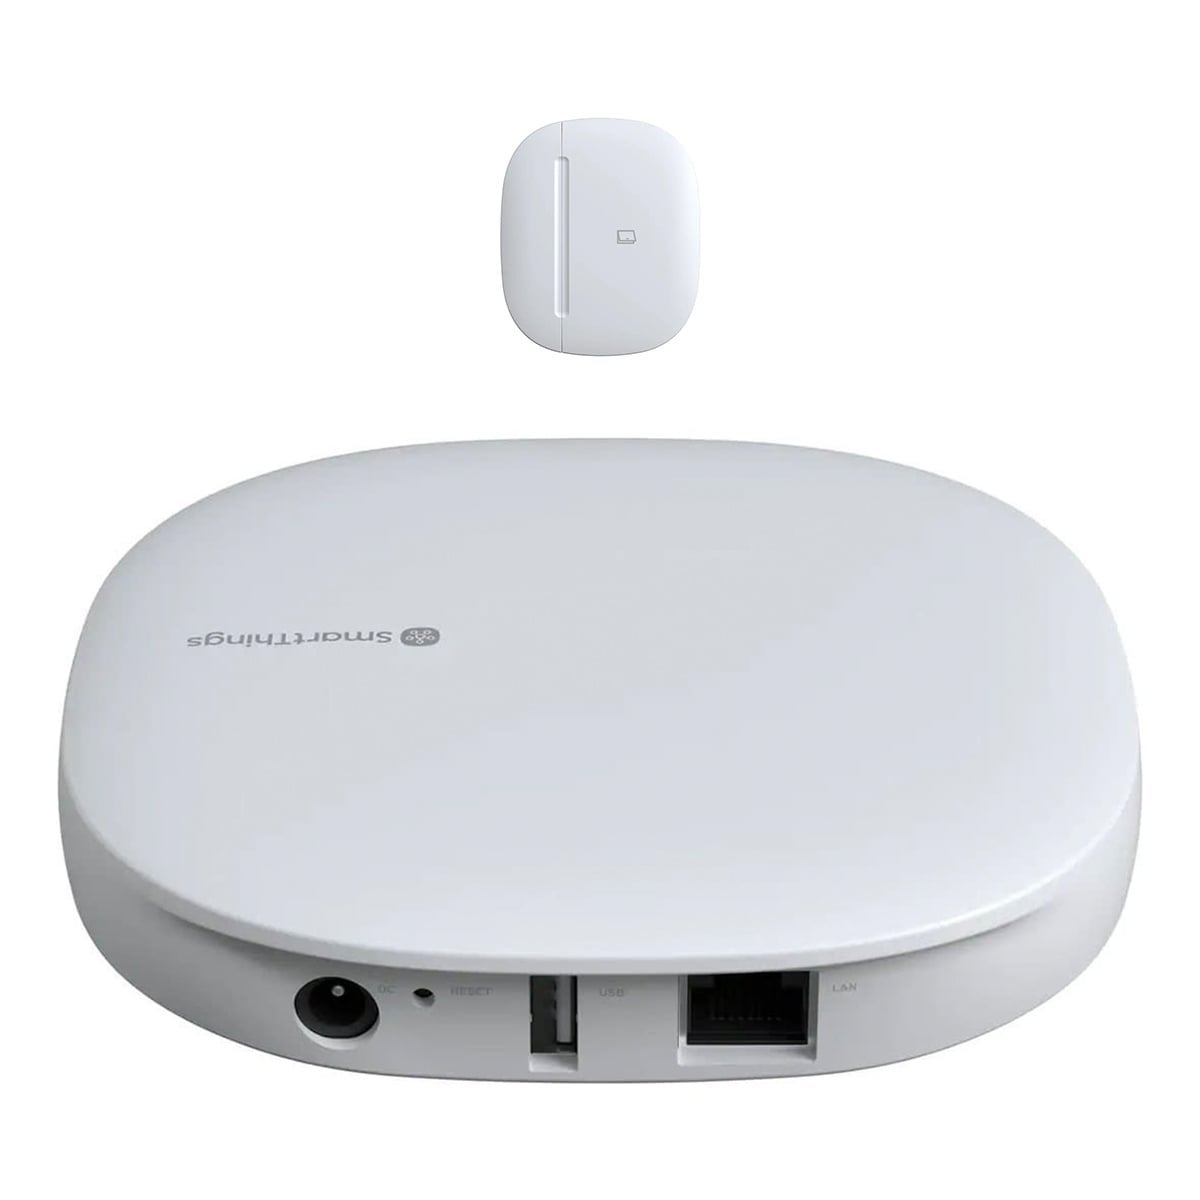 Samsung Smart Things Hub with Multipurpose Sensor - White